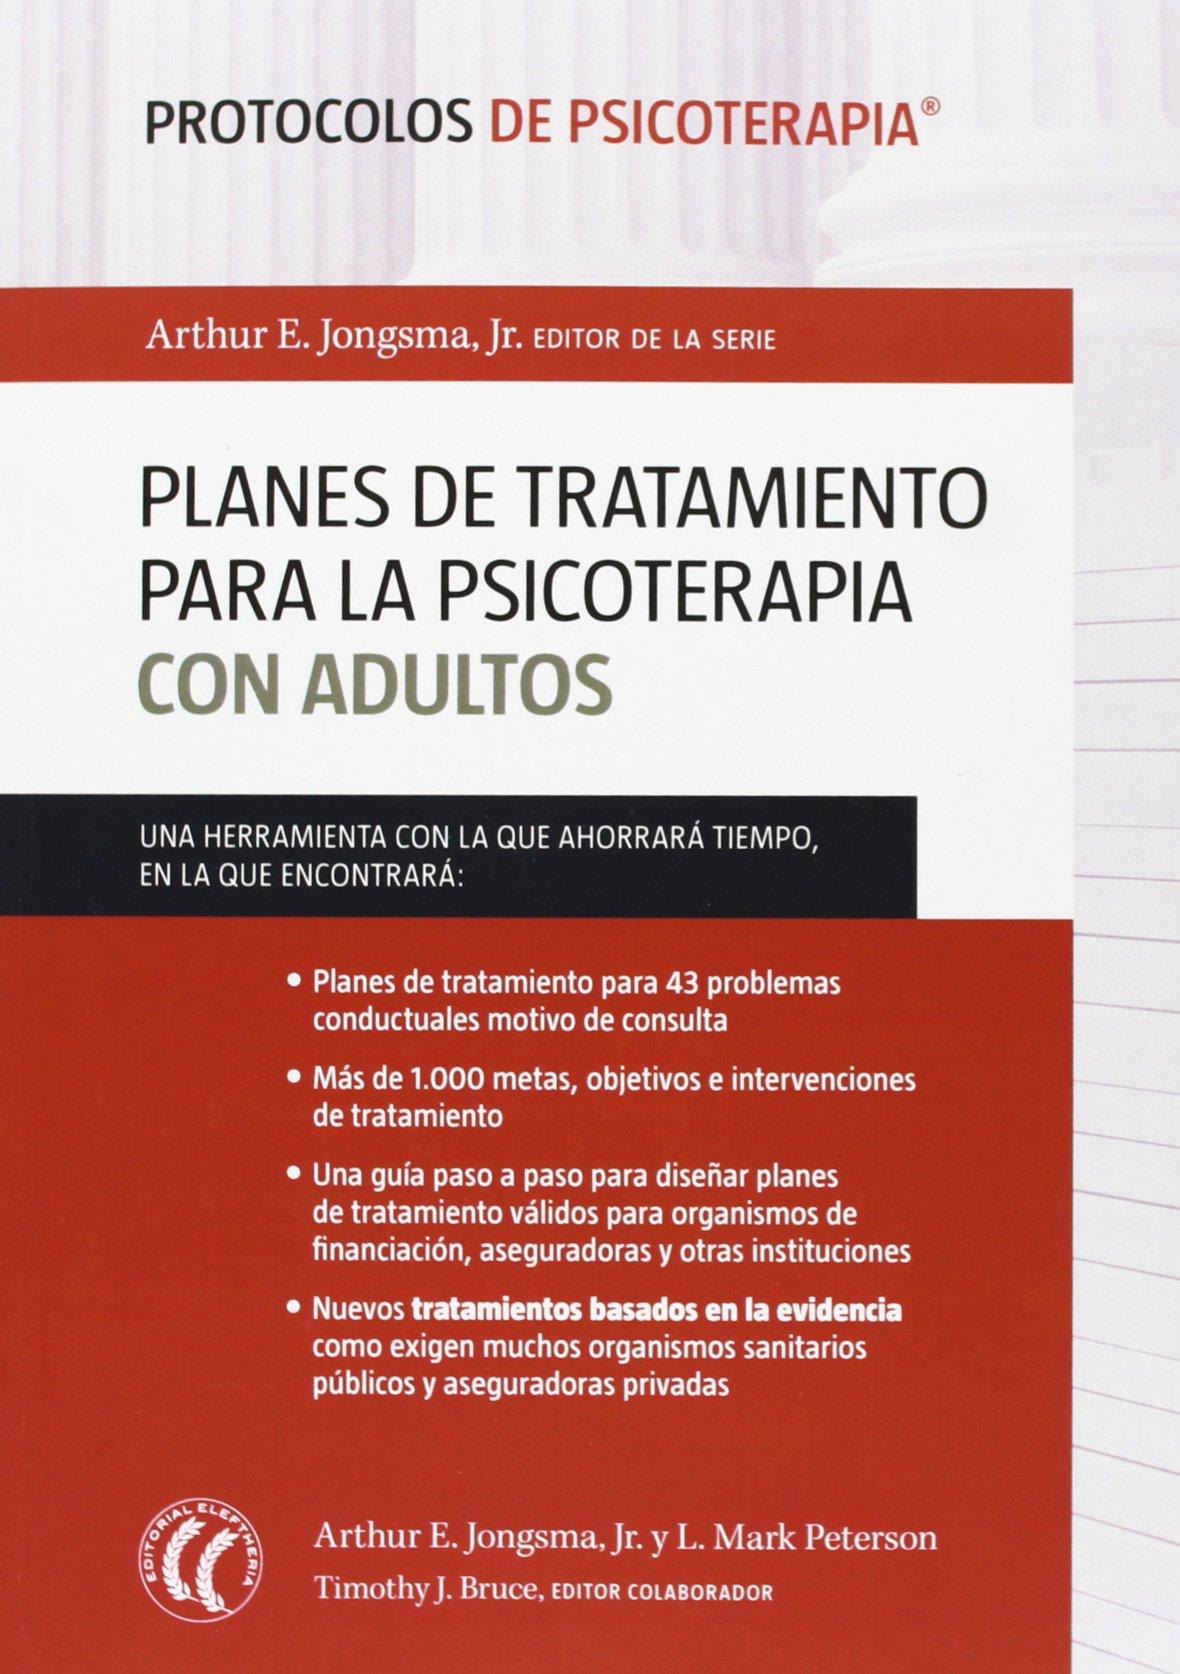 Planes tratamiento para psicoterapia adultos product image